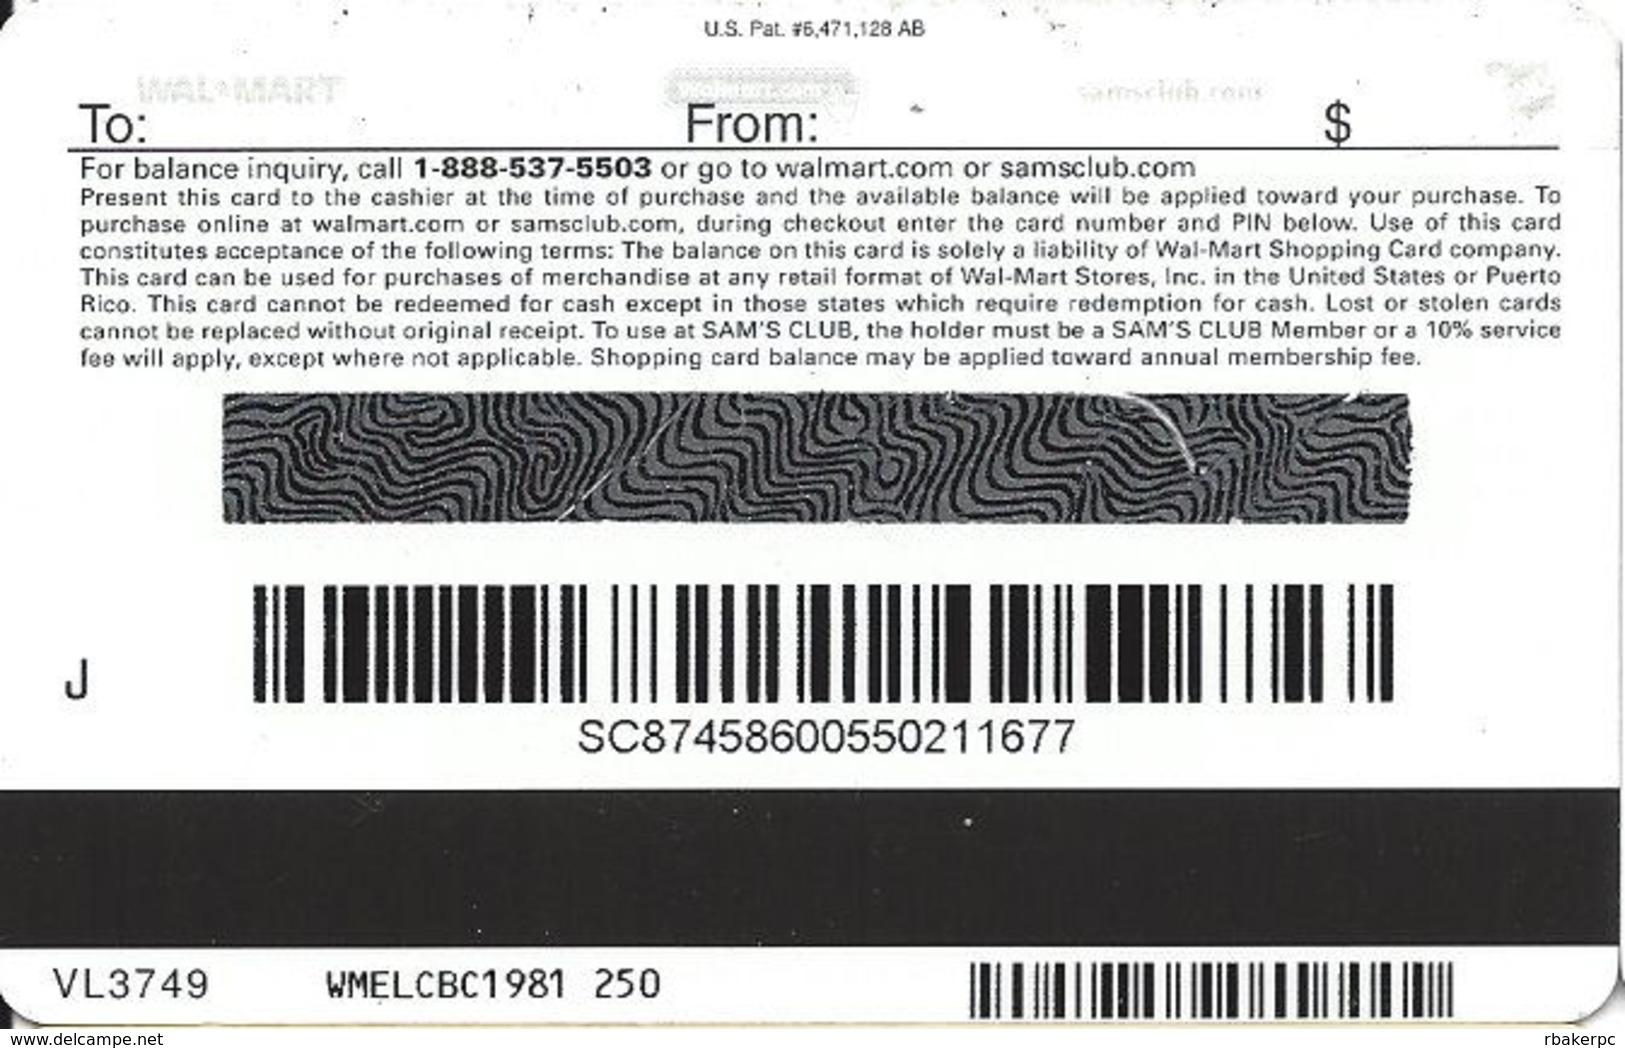 Walmart Gift Card - Metallic Silver Mirror Finish - Gift Cards